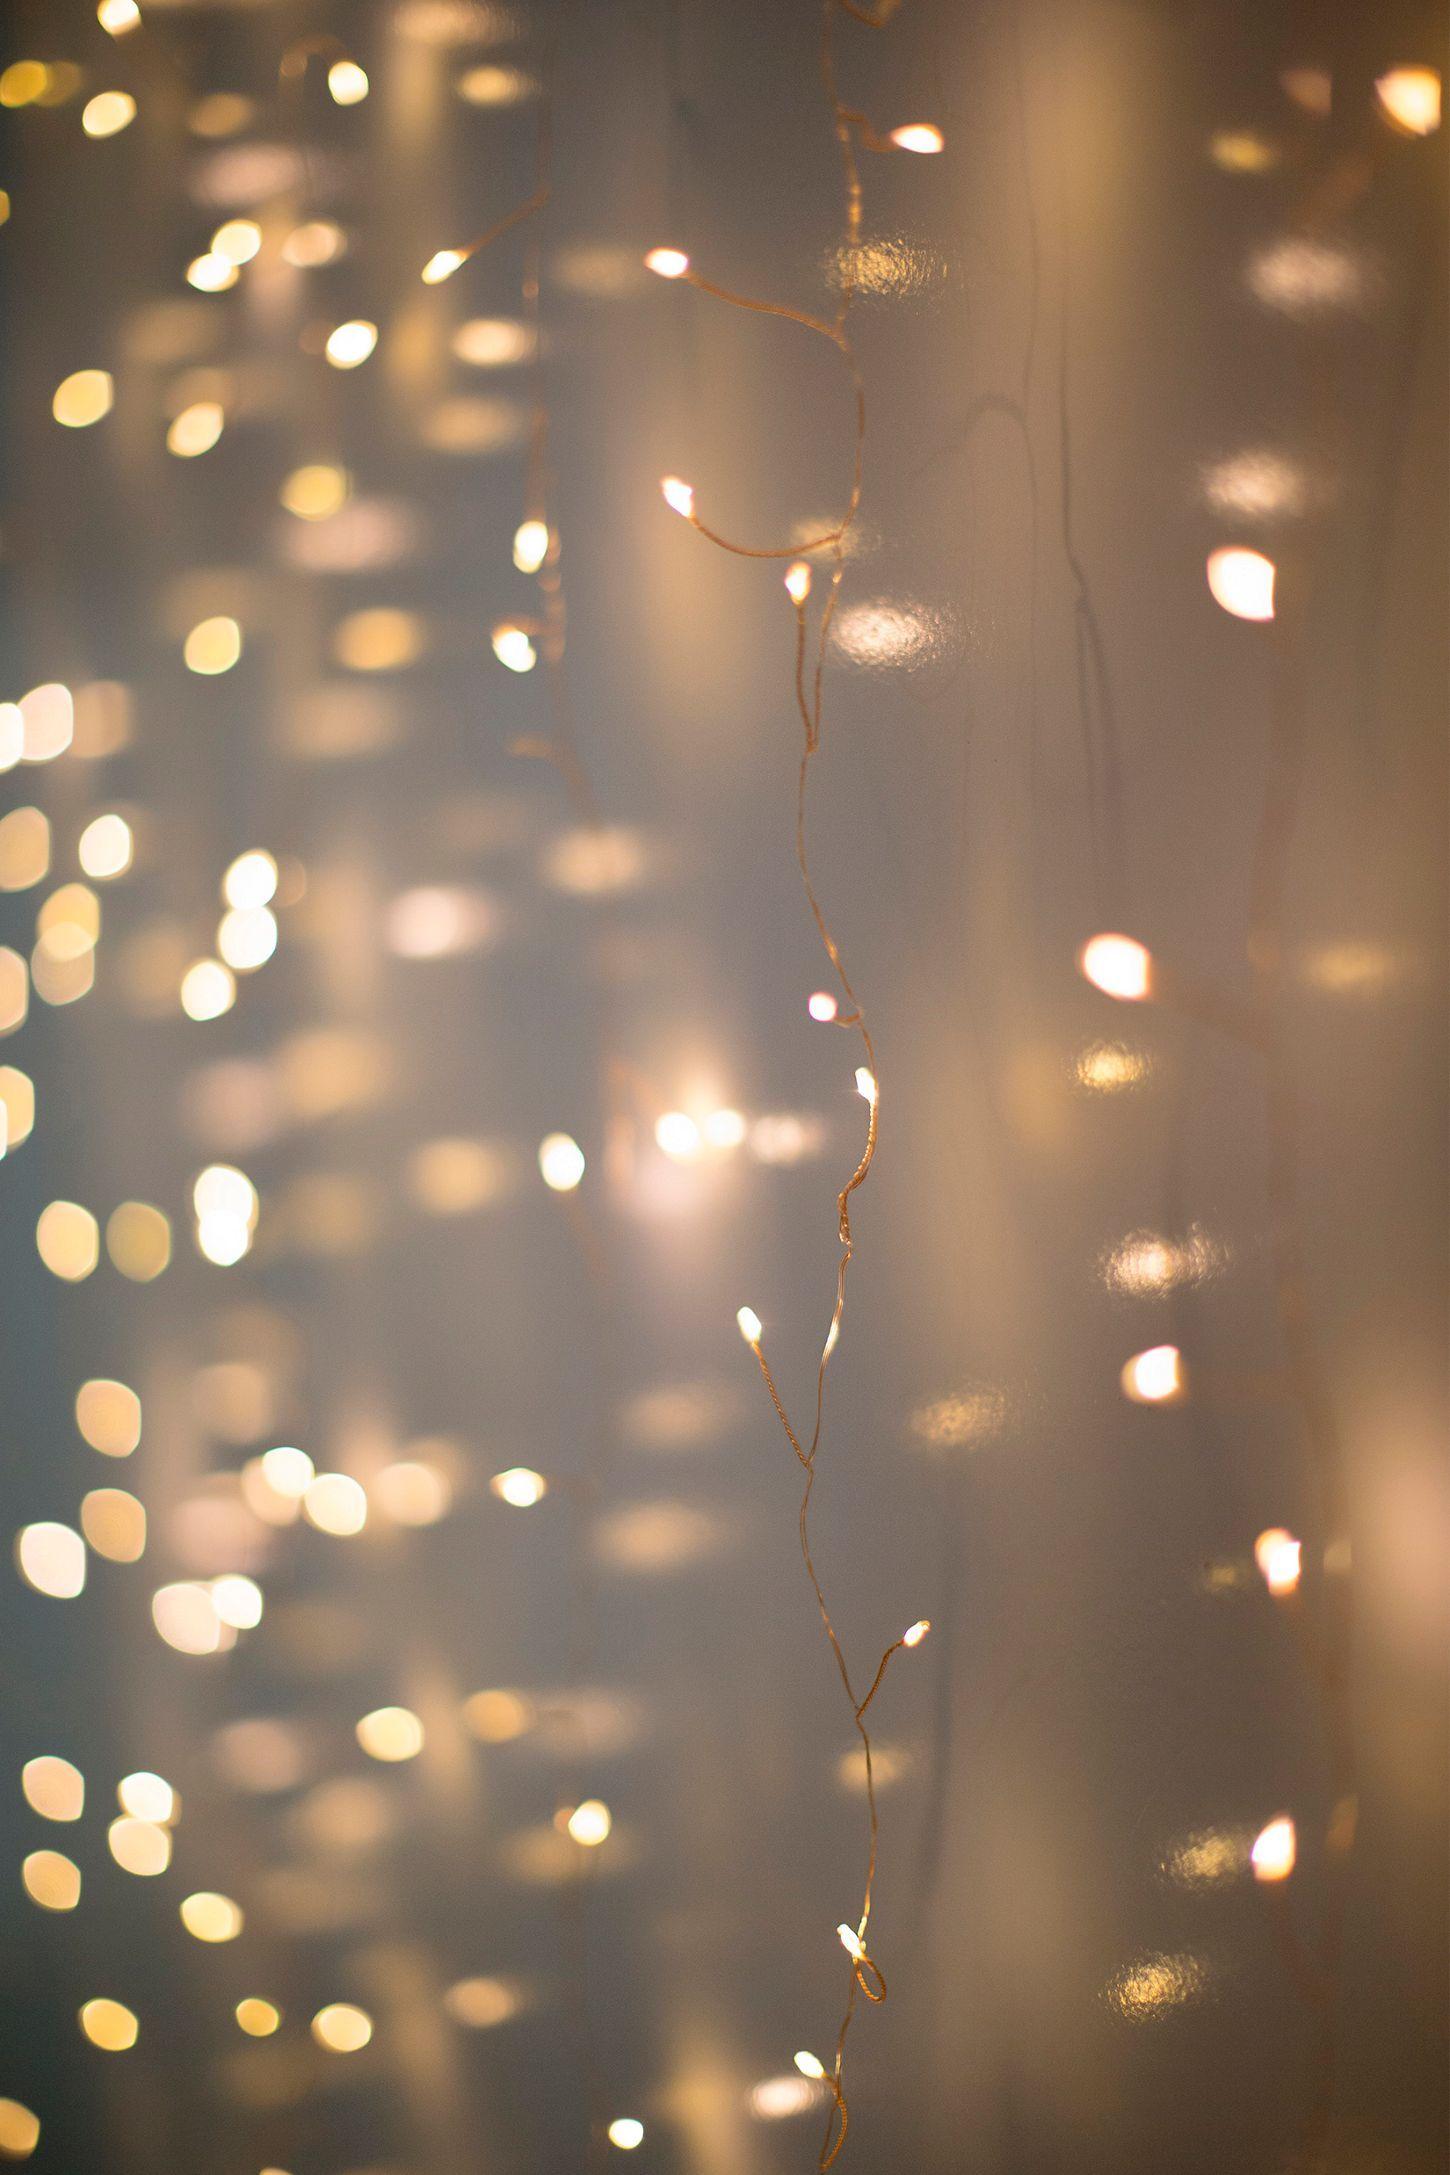 Stargazer Copper Curtain Lights, 7' Plug-In